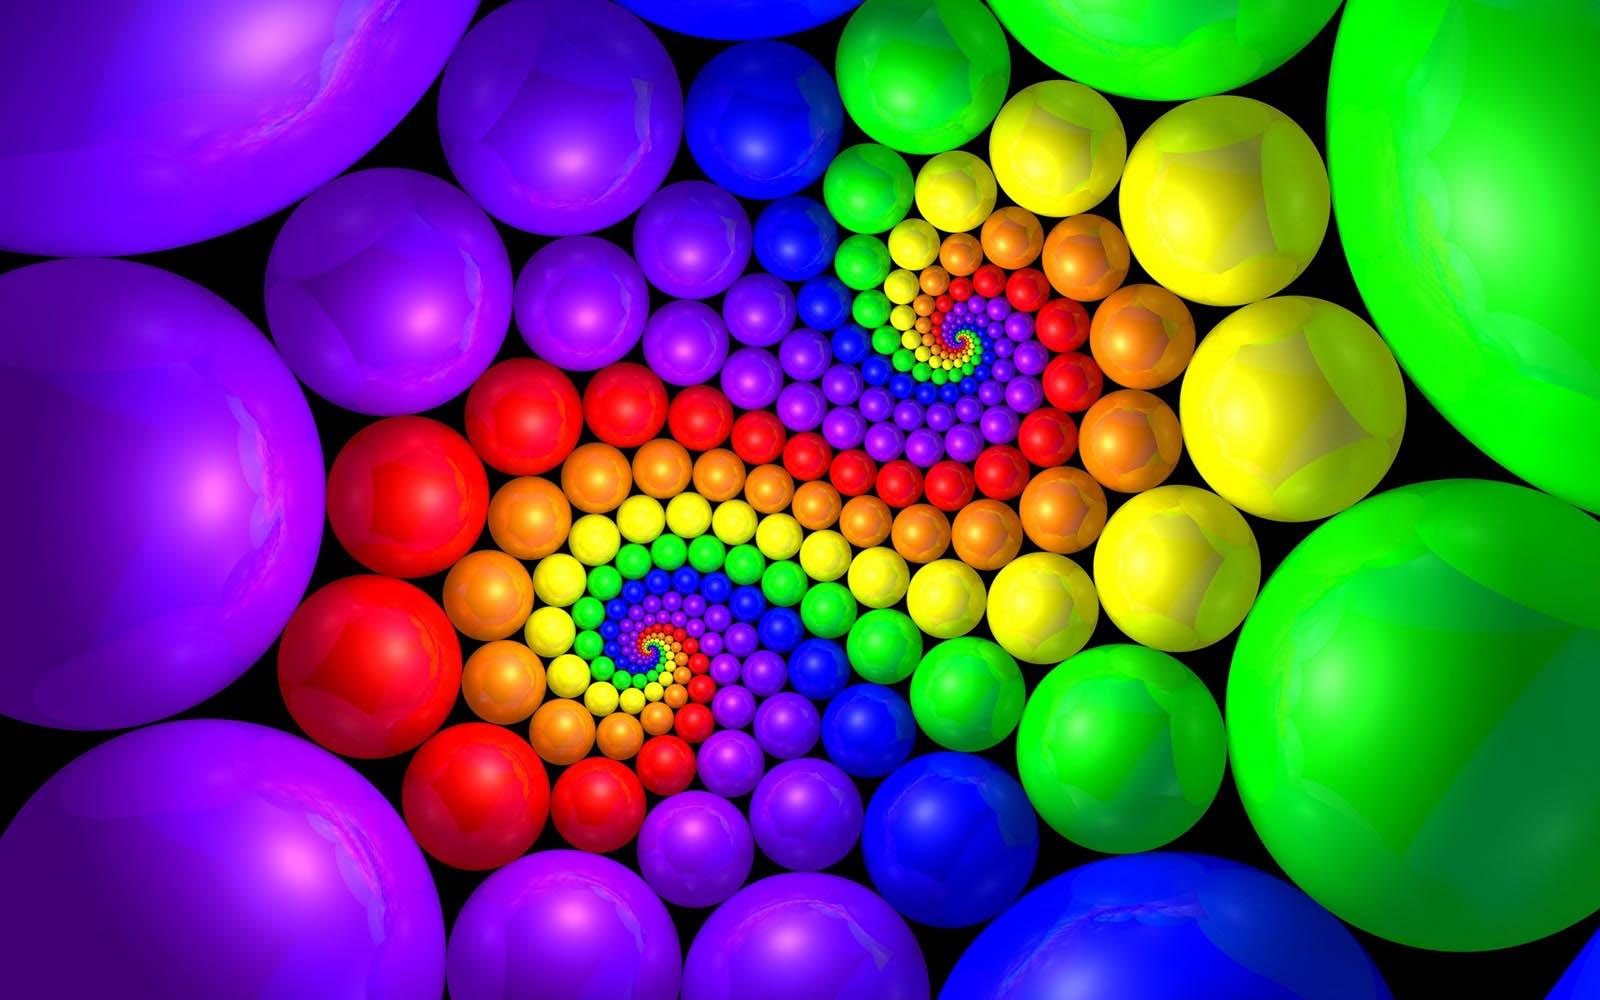 Colorful 3D Widescreen HD Desktop Wallpaper 1600x1000